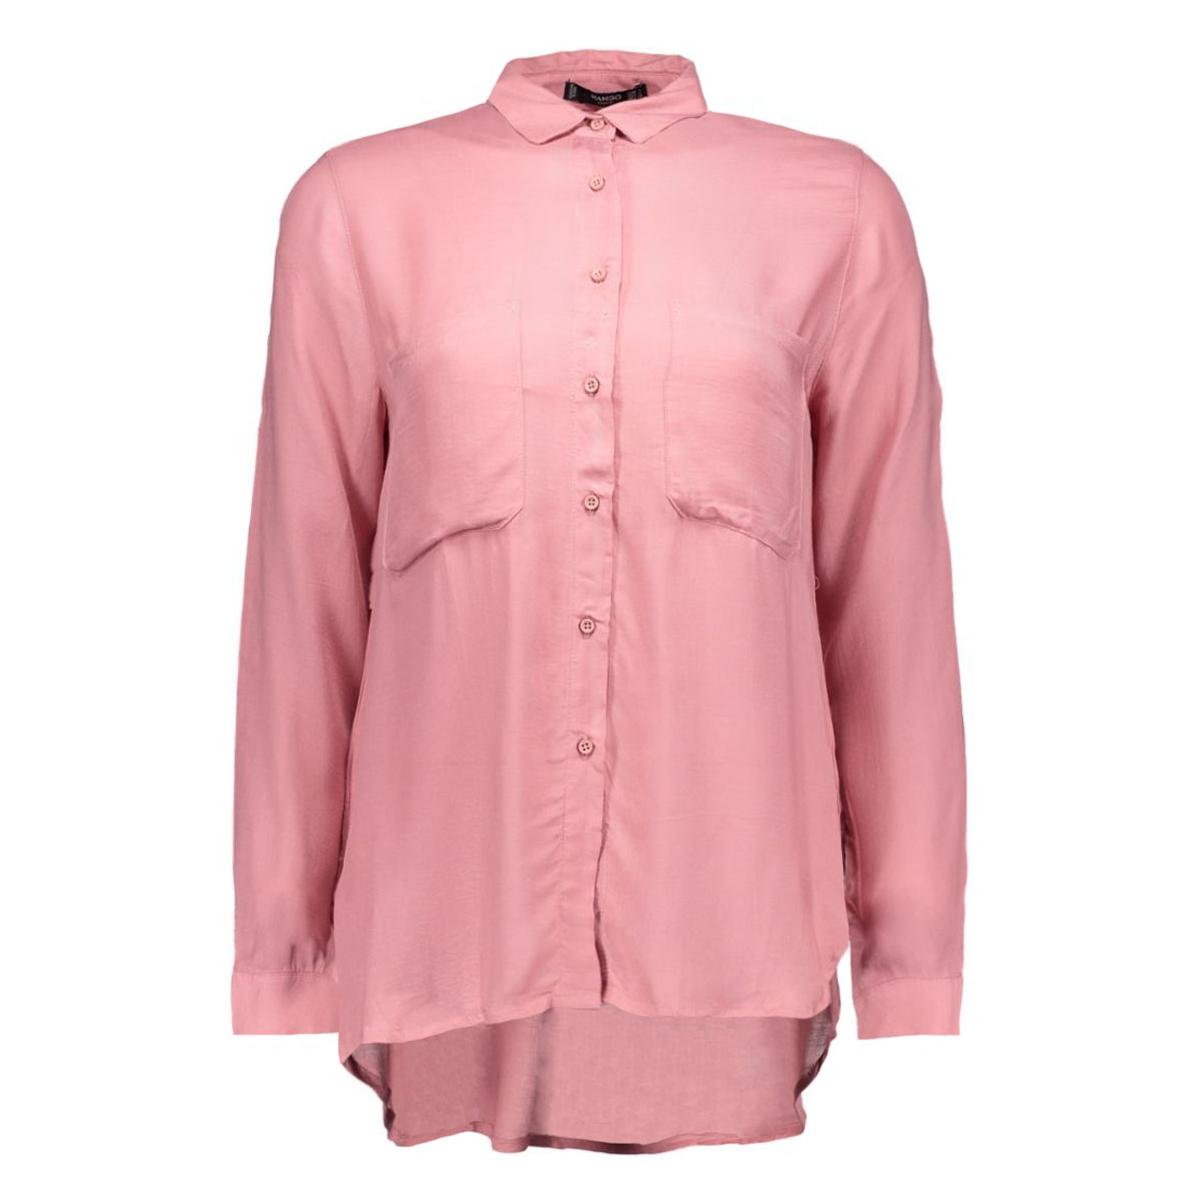 shirt basica mango blouses 71080197-81